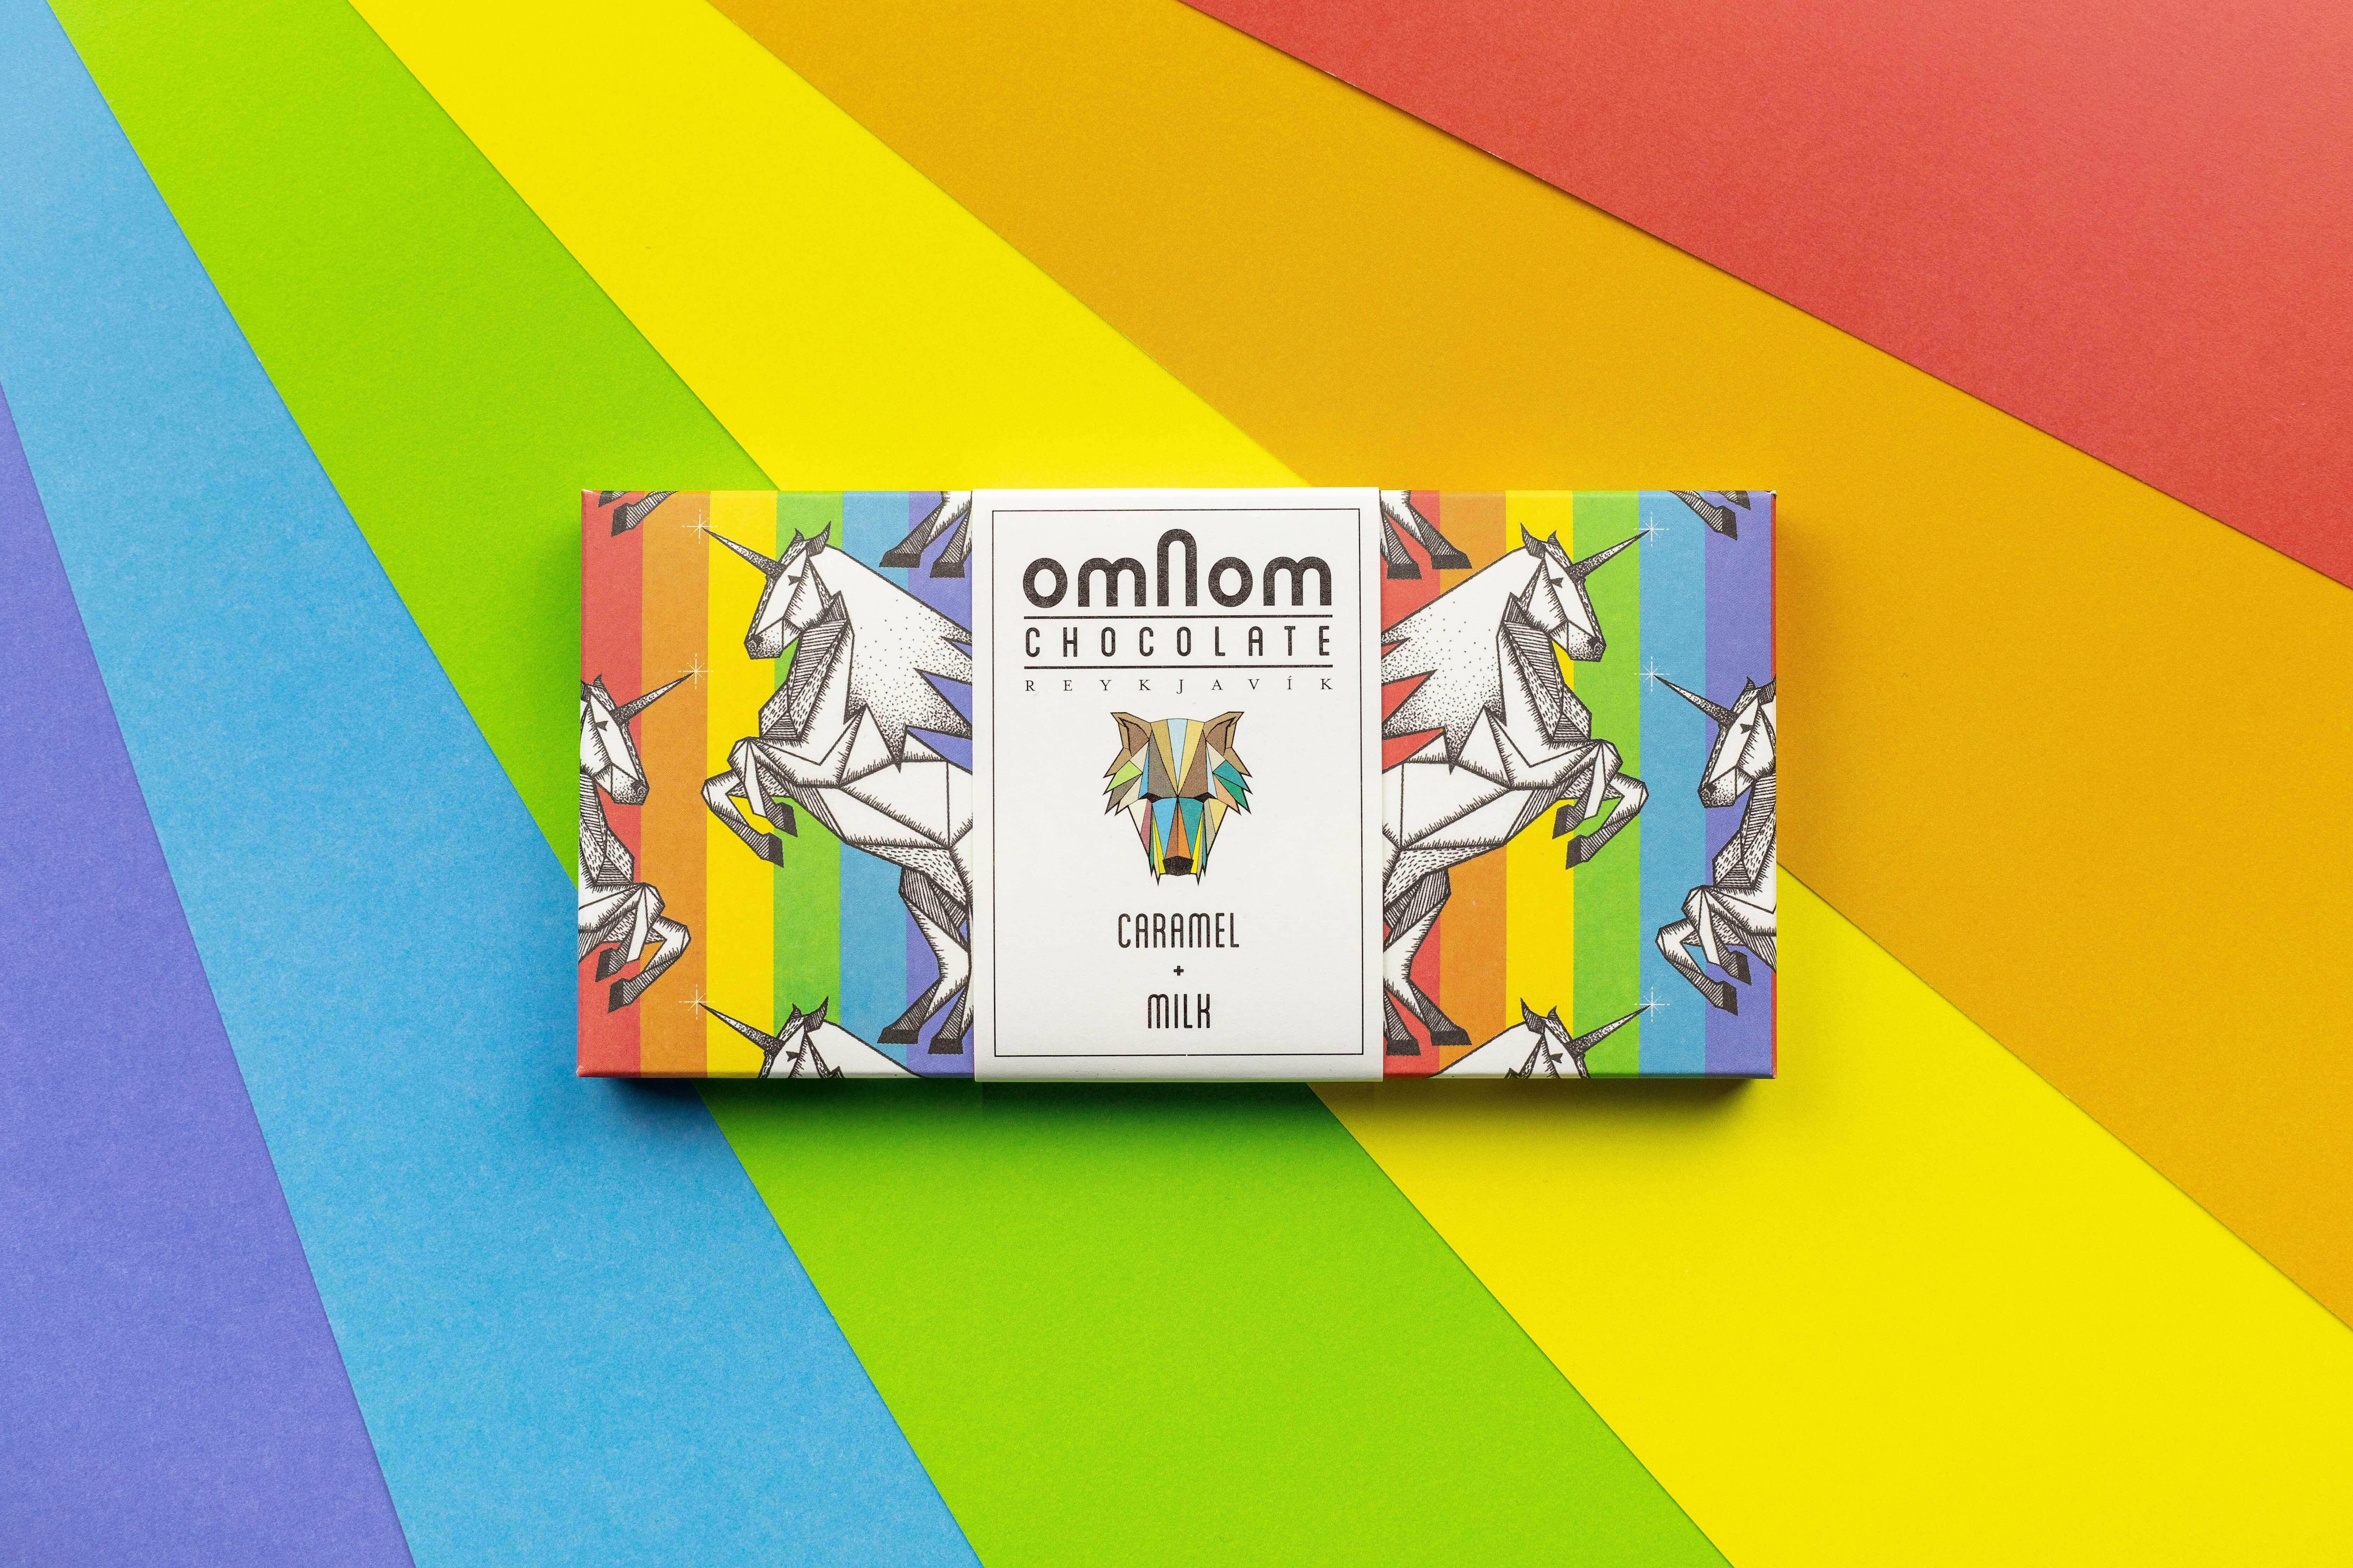 Omnom Caramel + Milk Pride Bar chocolate candy bar with rainbows and unicorns